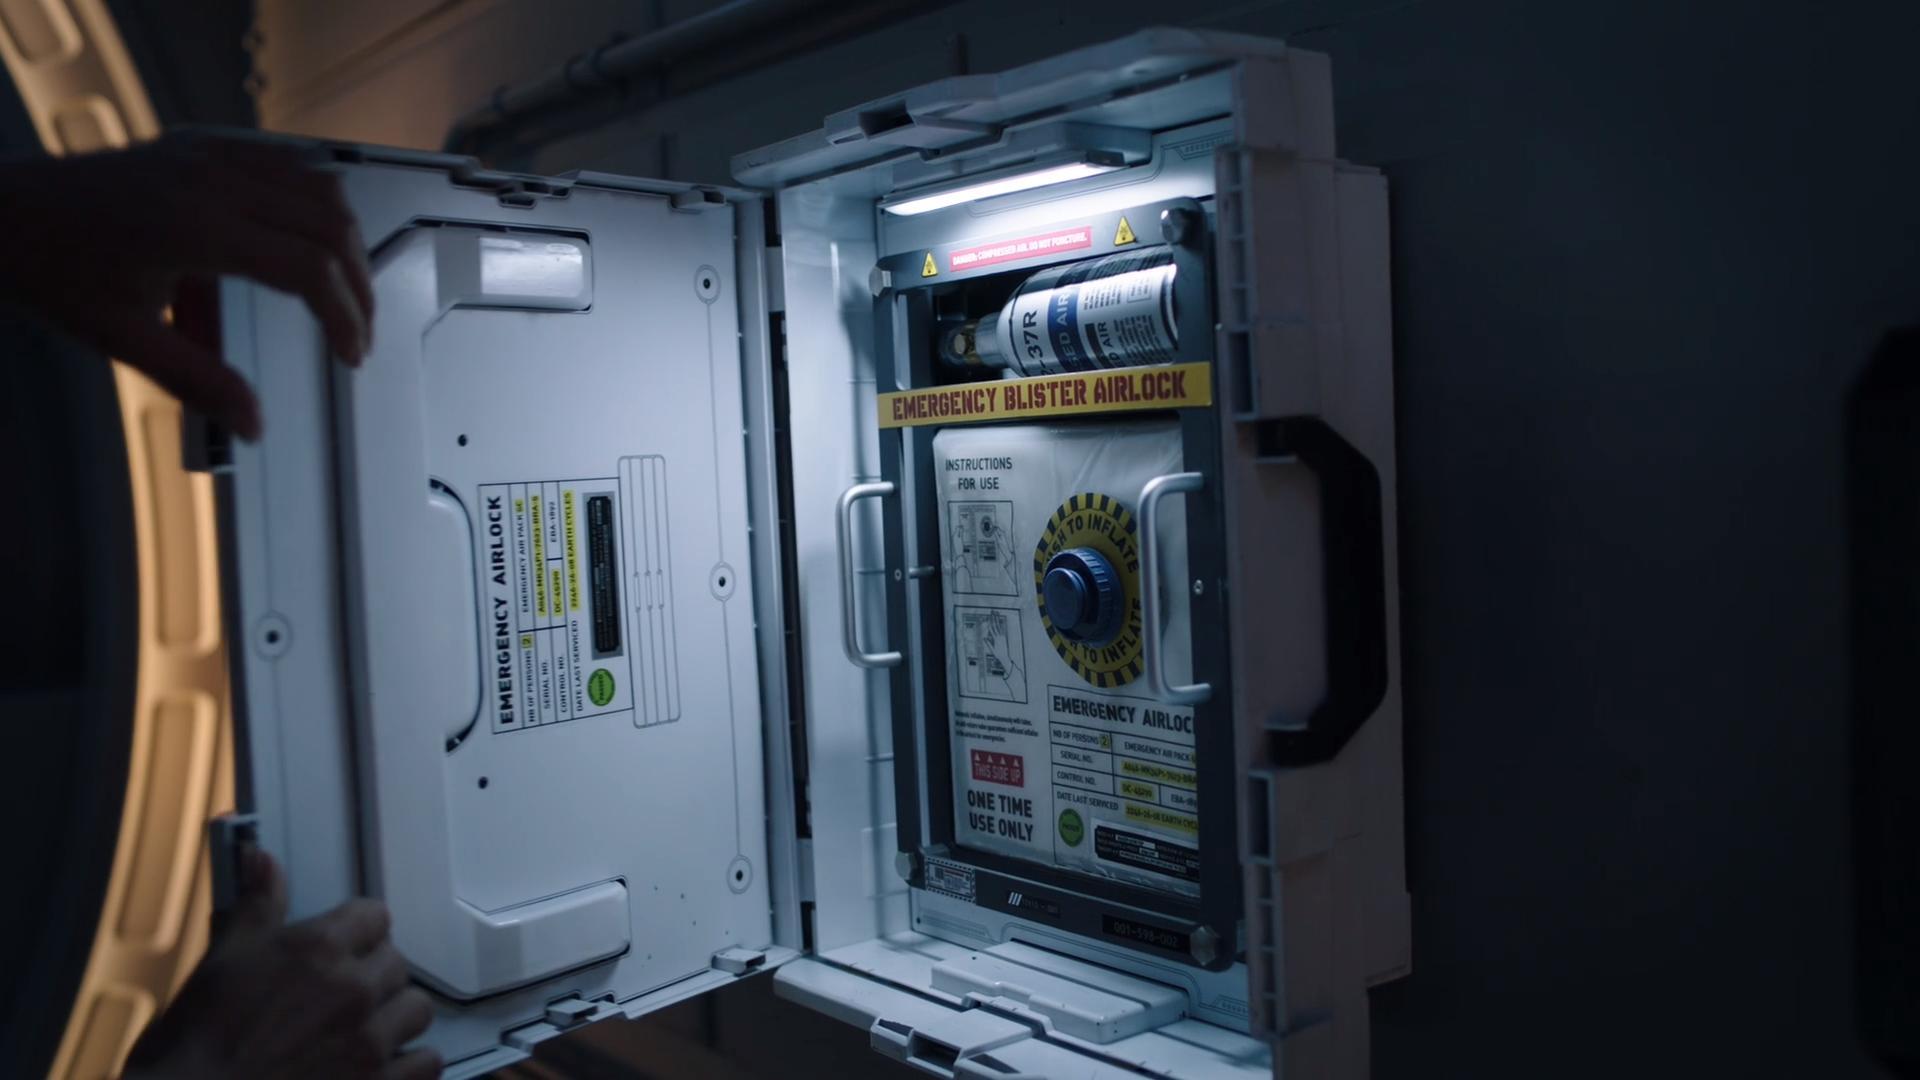 Emergency Blister Airlock